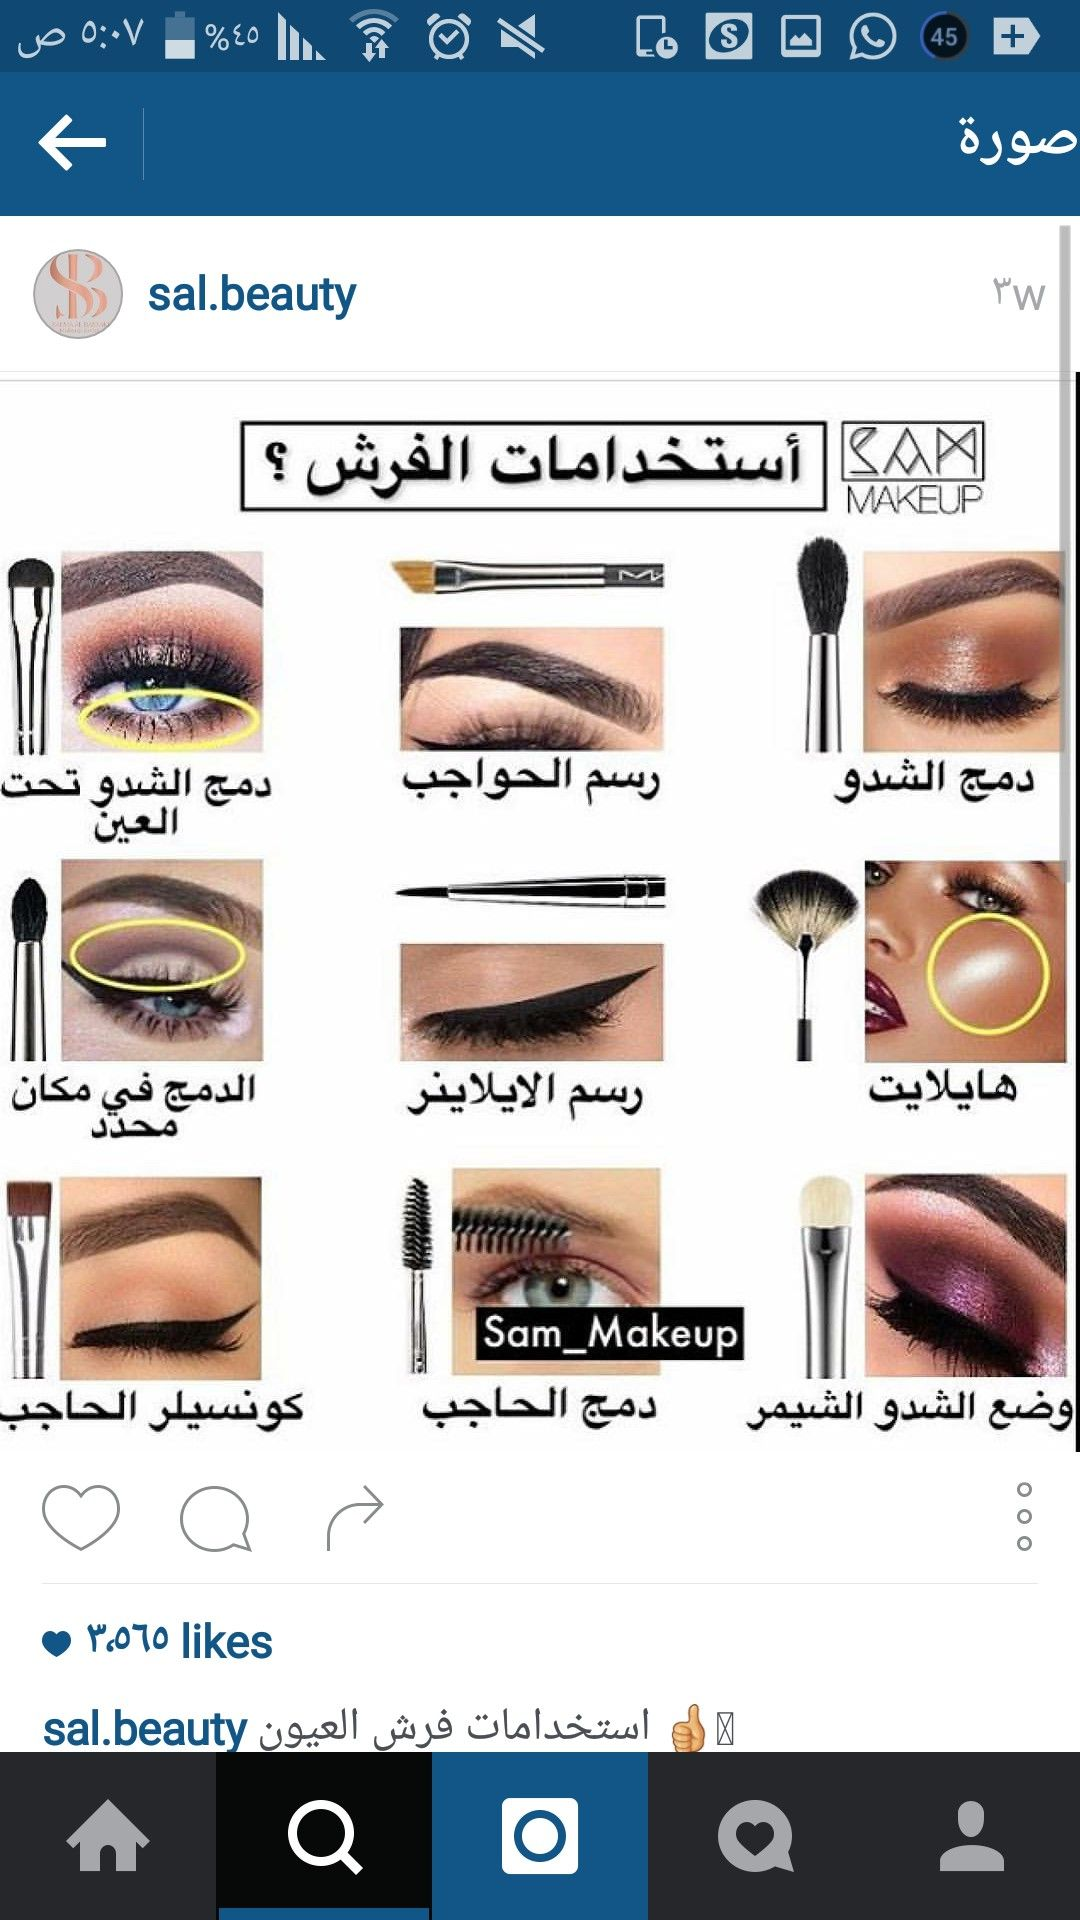 Pin By Layla 2017 On Makeup Pinterest Makeup Makeup Makeover Learn Makeup